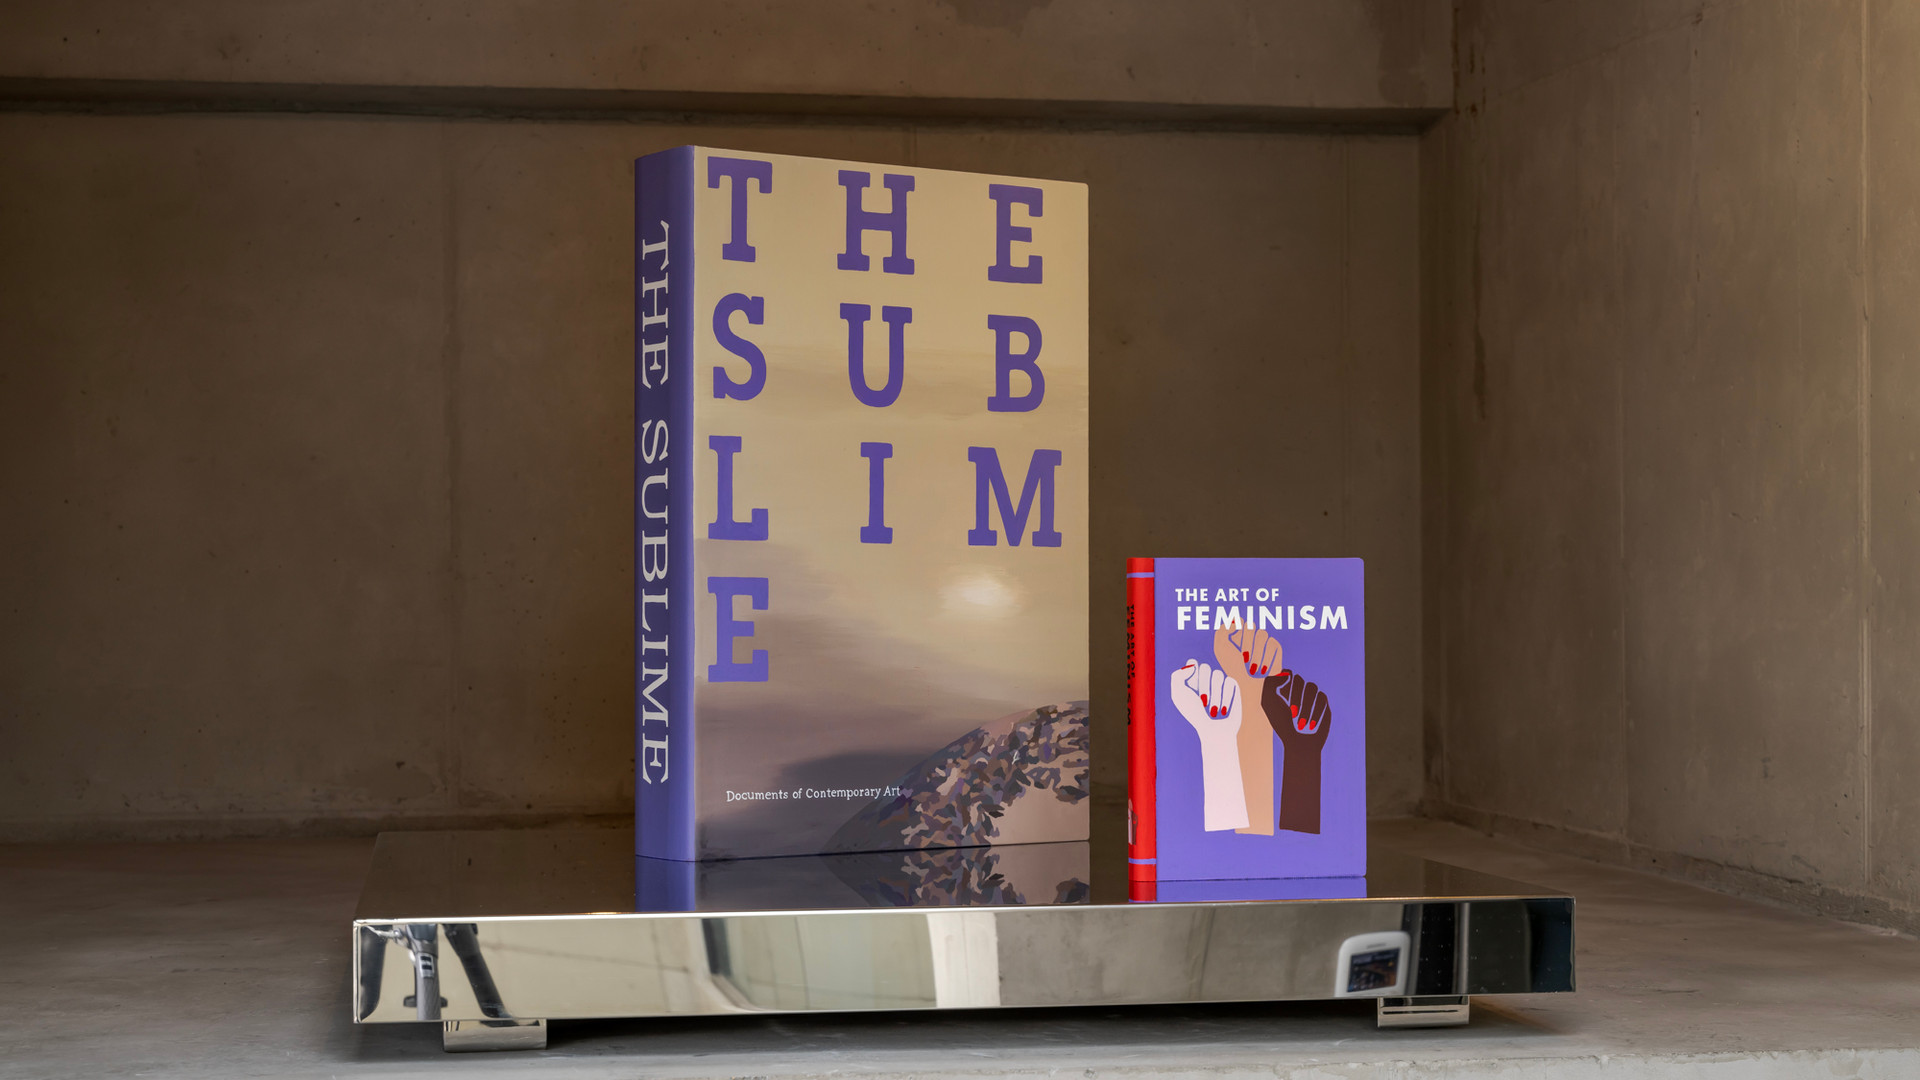 The Sublime, 2012, Acrylic on plexiglas, 41 x 58.5 x 10.5 cm(left), The Art of Feminism, 2020, Acrylic on canvas, Plexiglas, 18.1 x 24 x 2.9